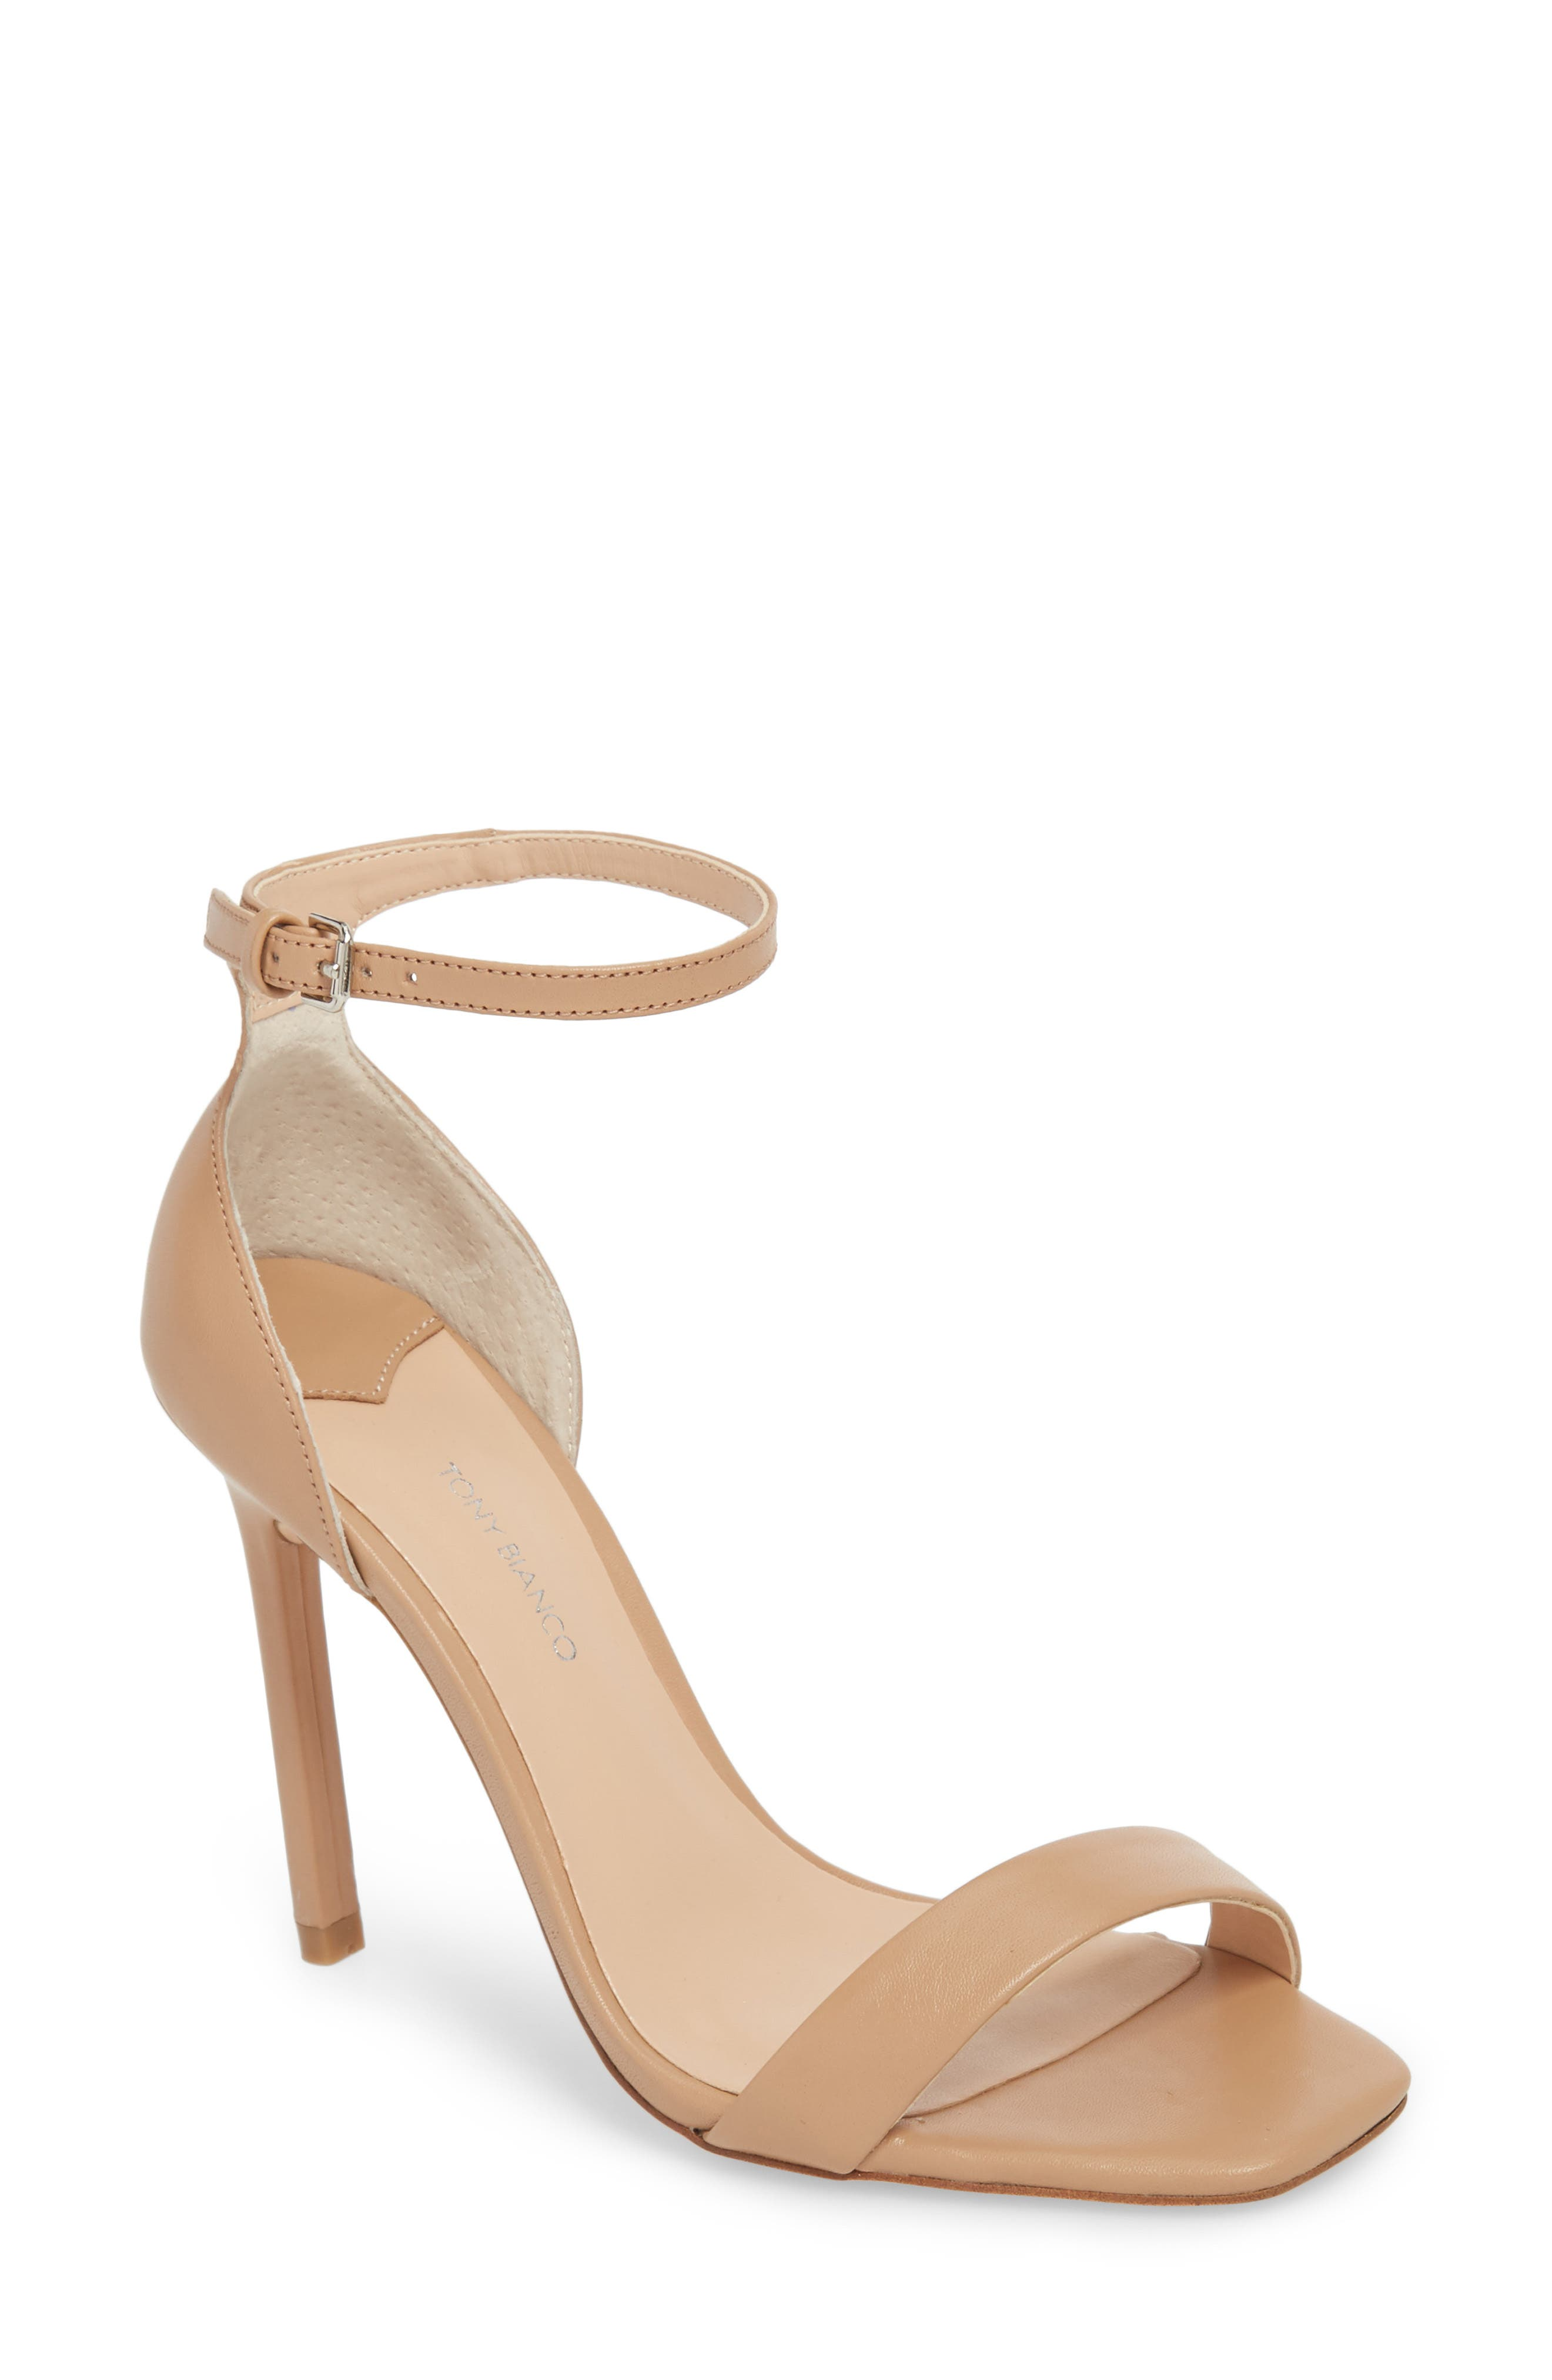 Tony Bianco Sacha Ankle Strap Sandal, Beige